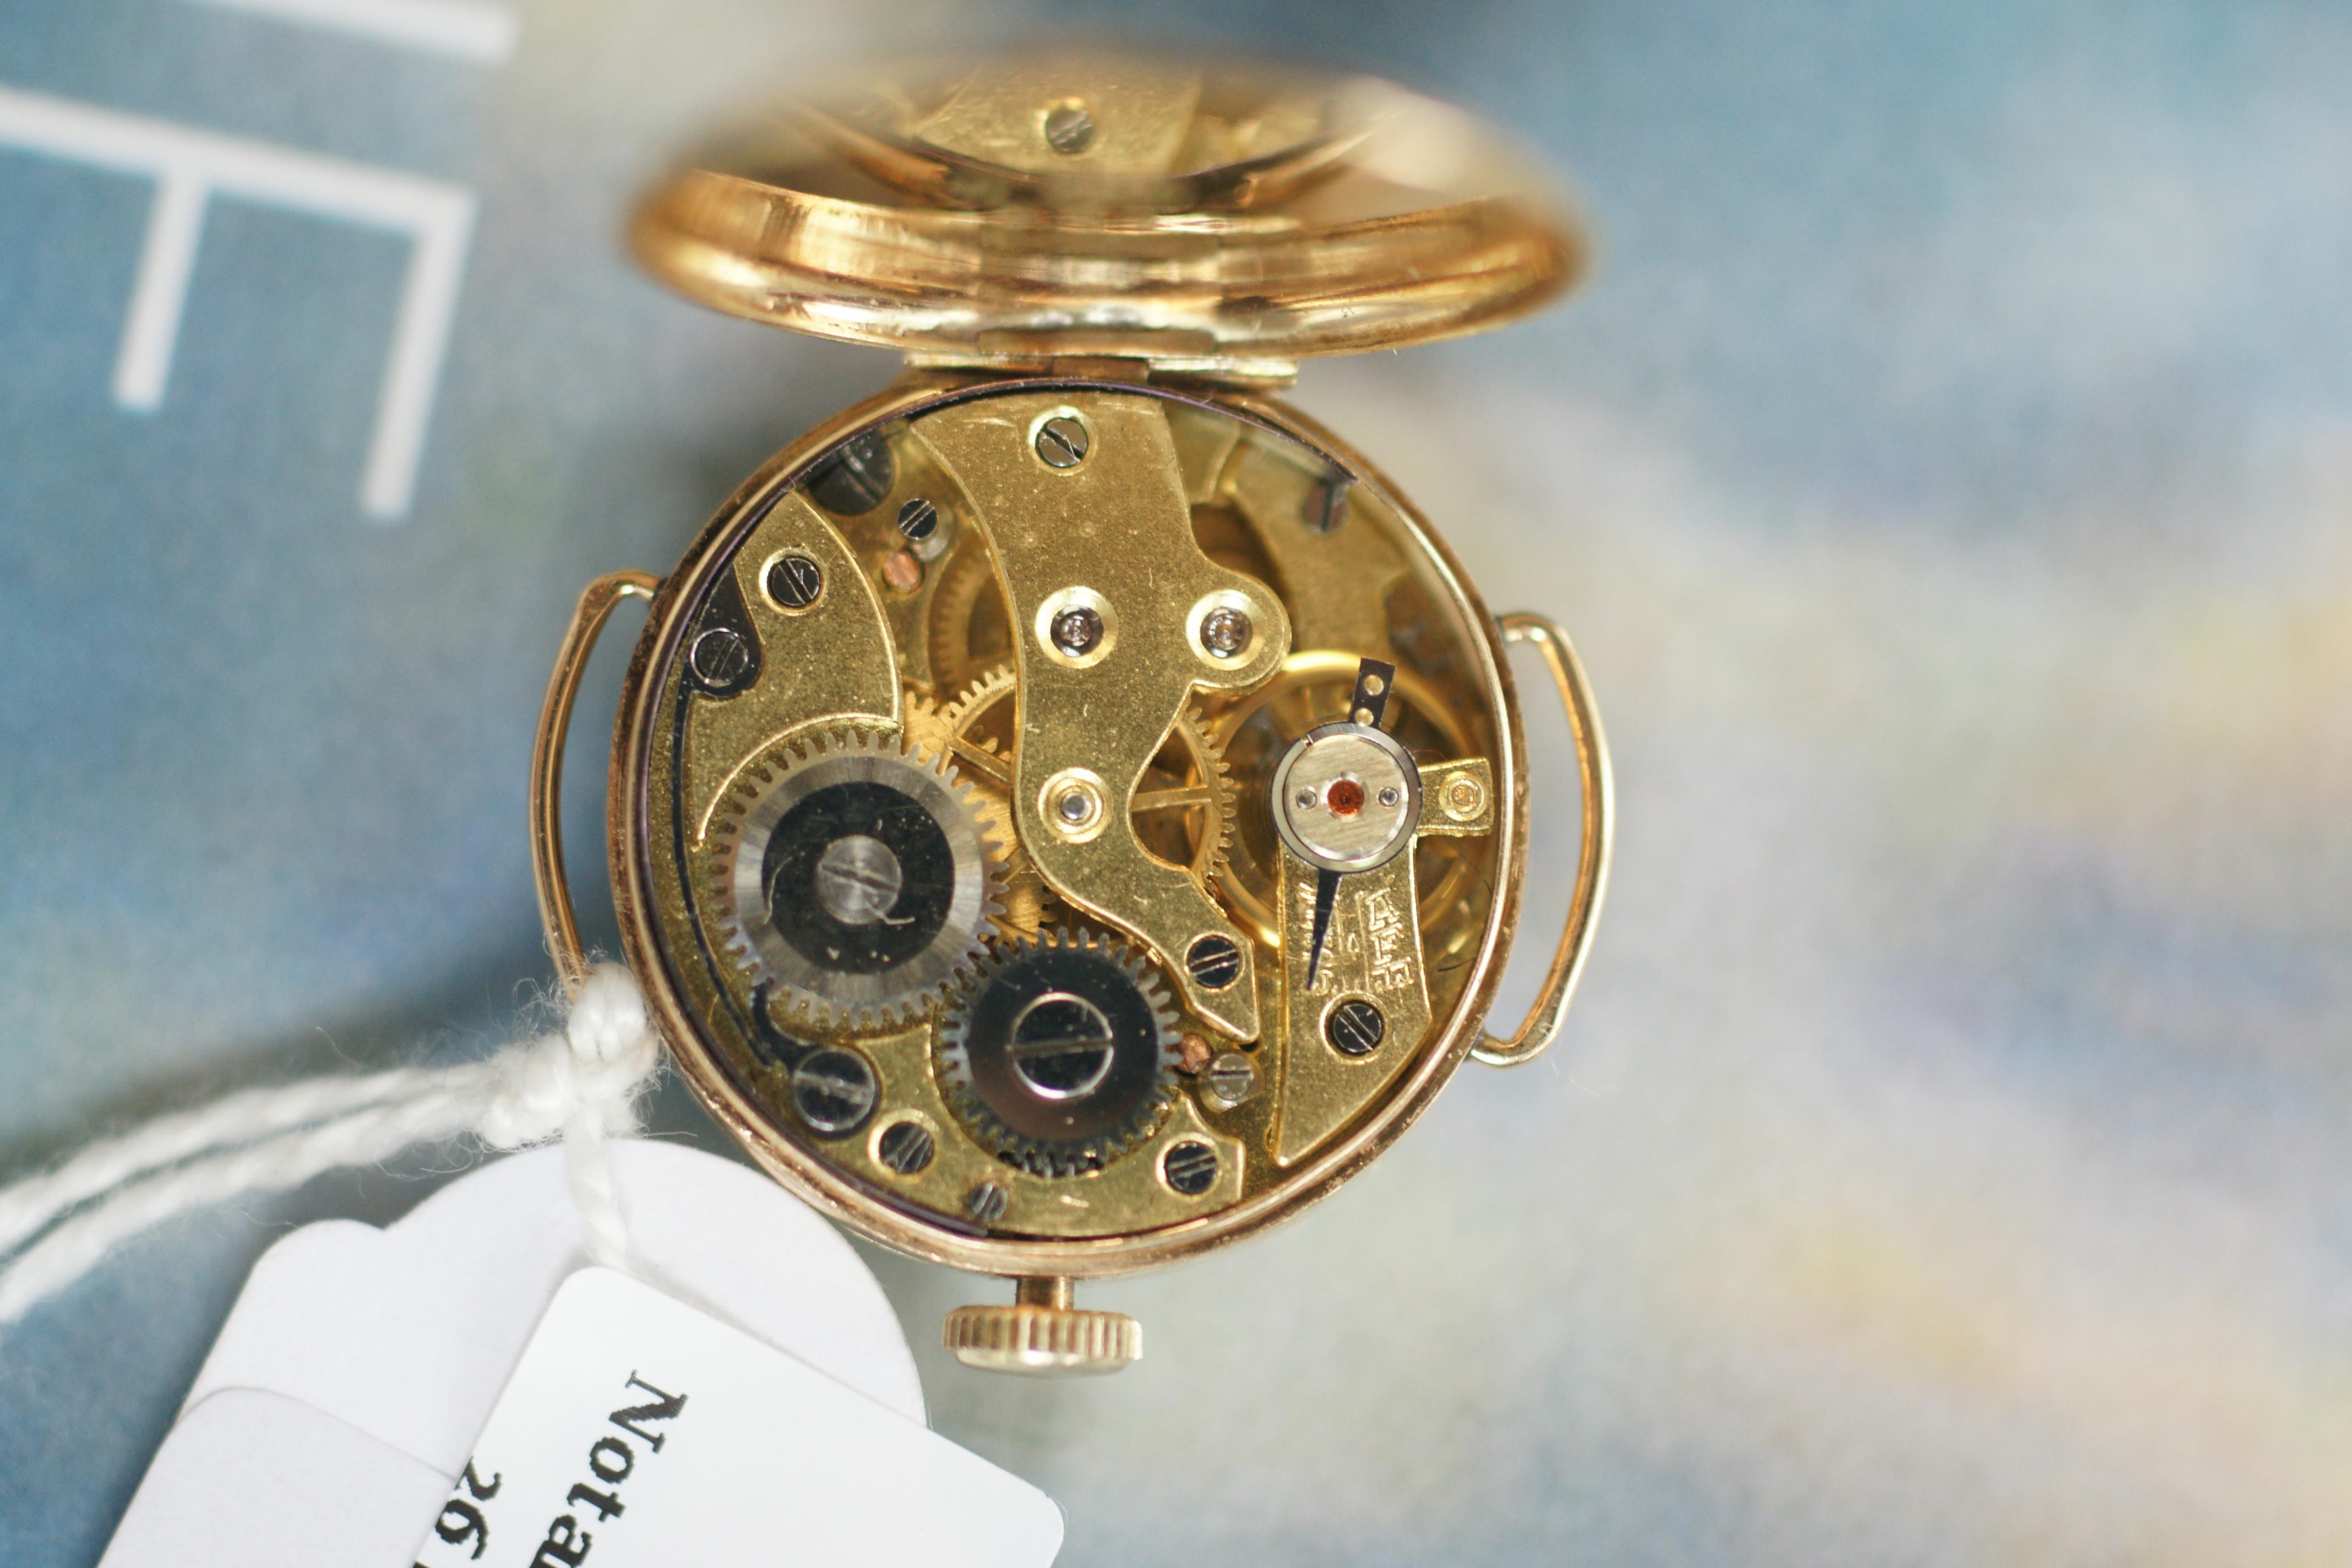 Name:  Chronometre Sixta003.jpg Views: 85 Size:  1.91 MB